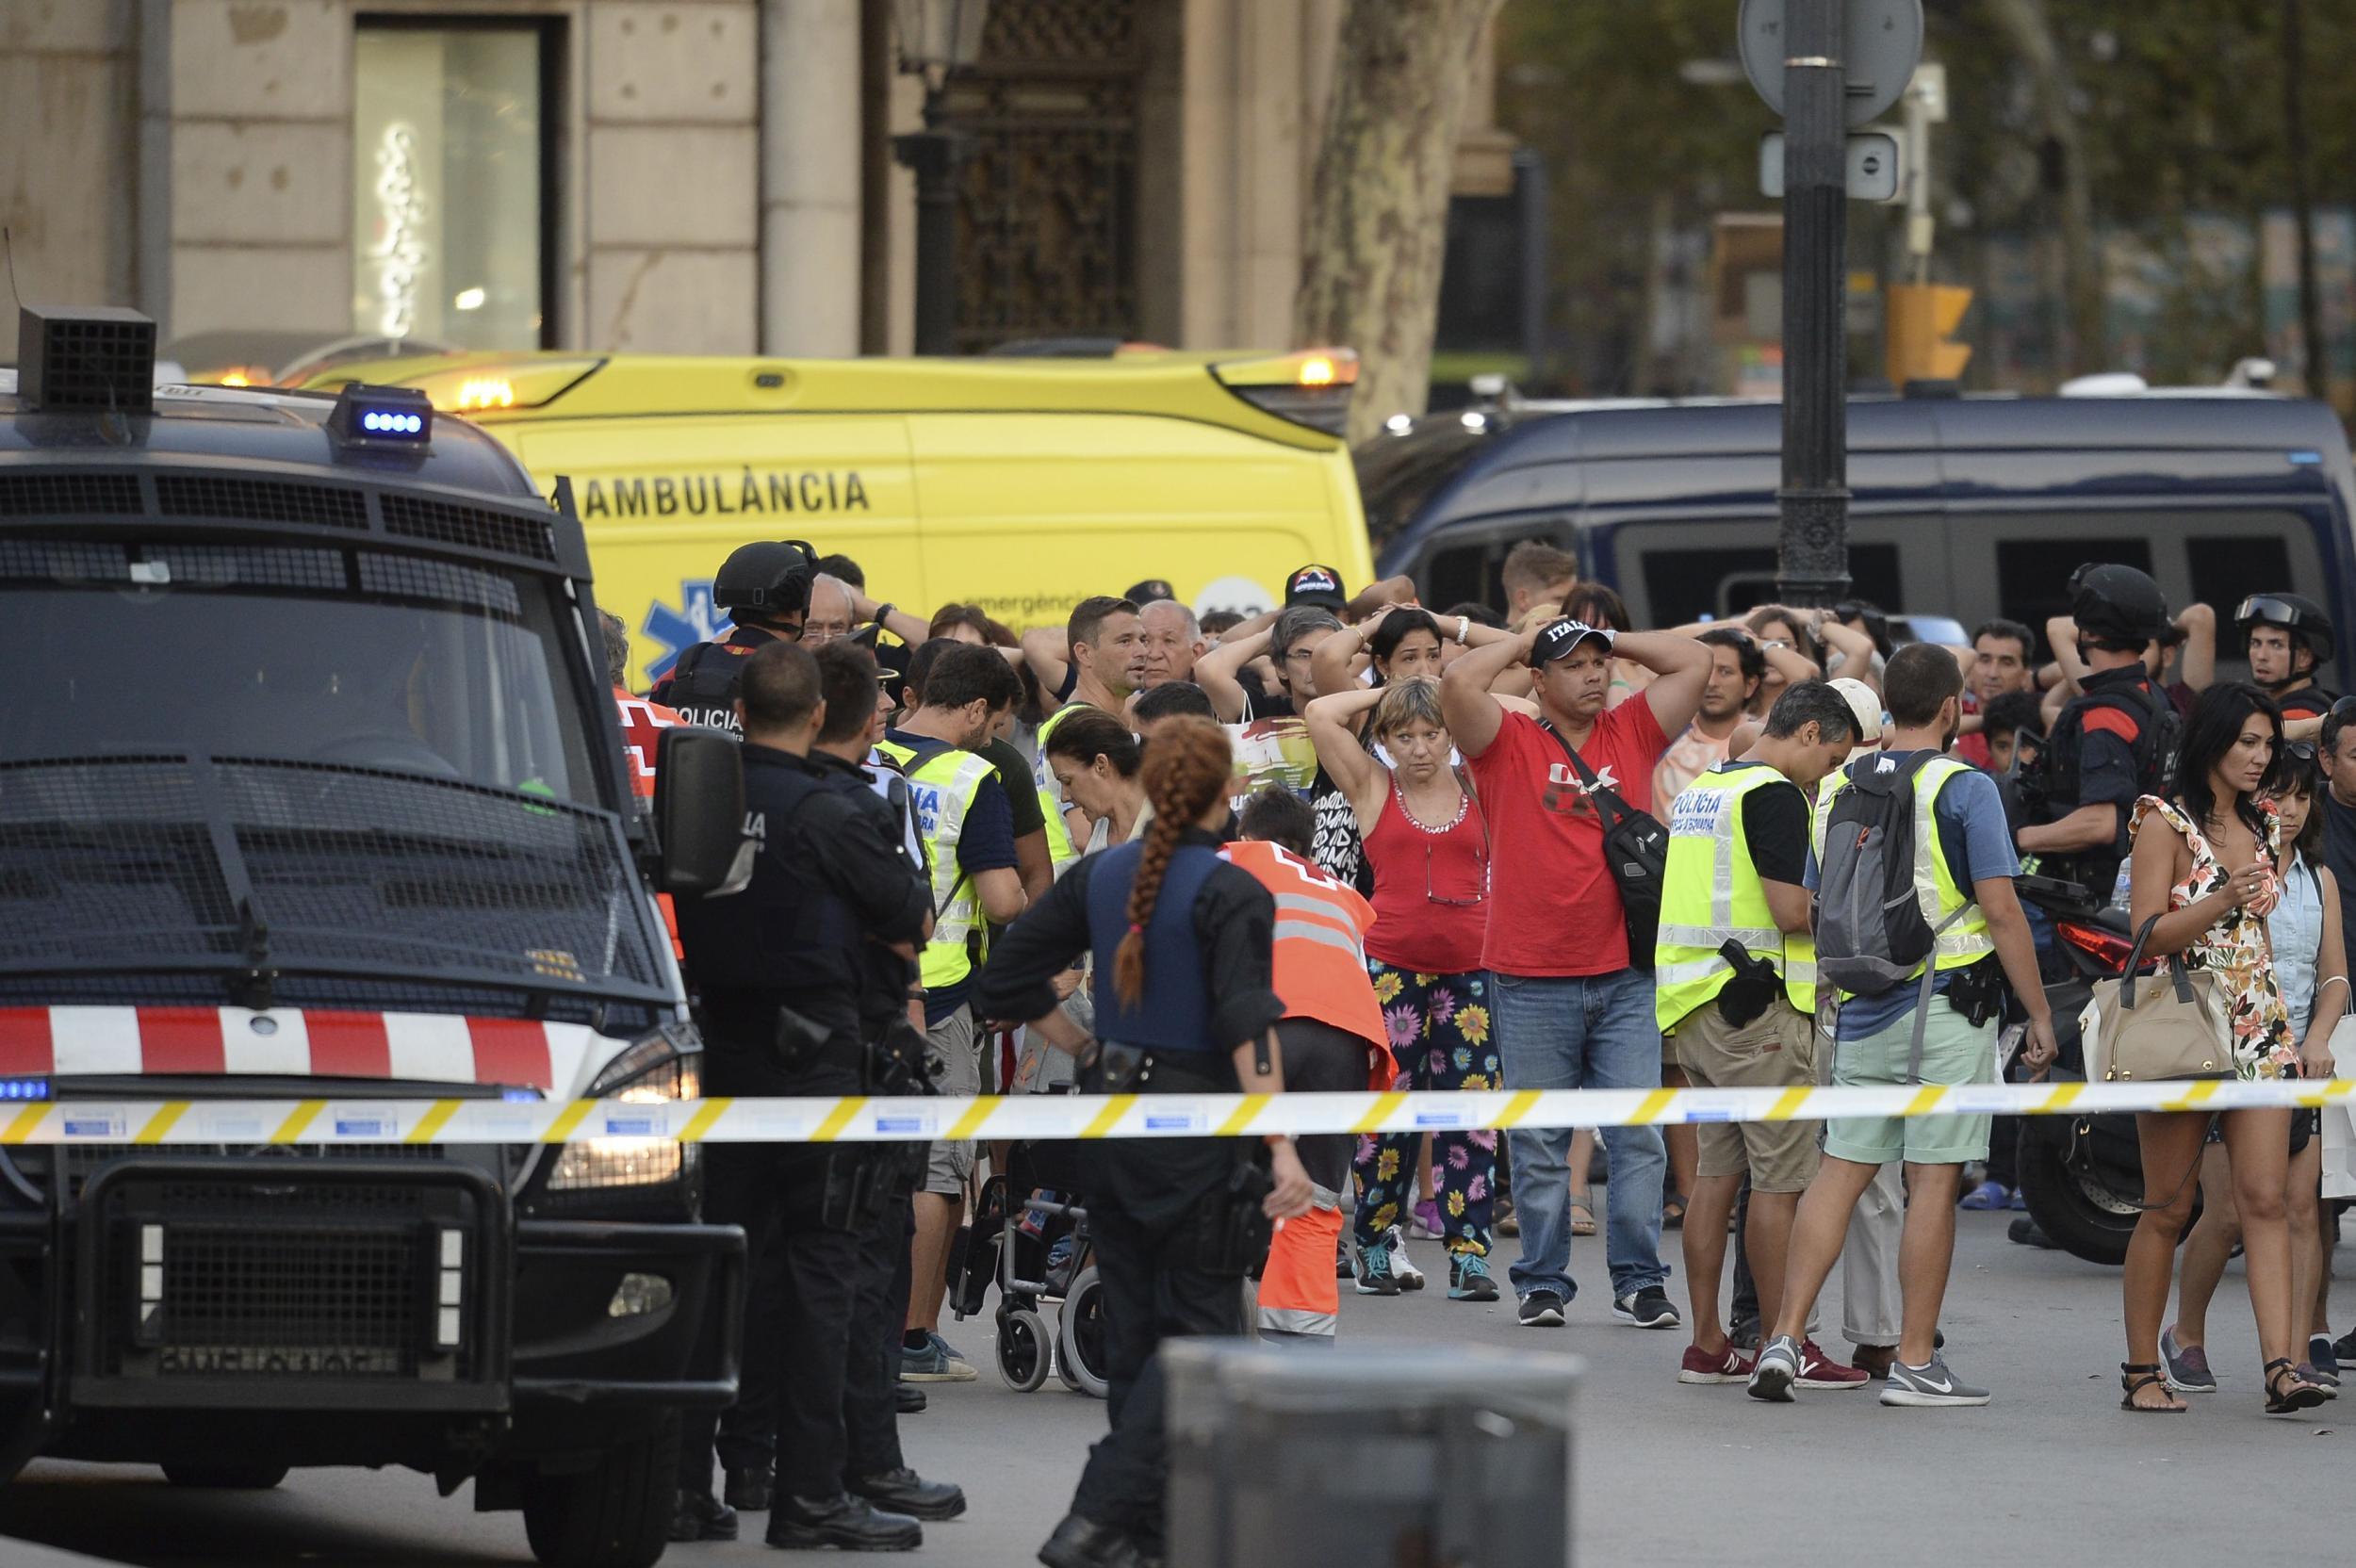 Terroranschlag Twitter: Barcelona Attack: Woman Caught Up In Third Terror Event